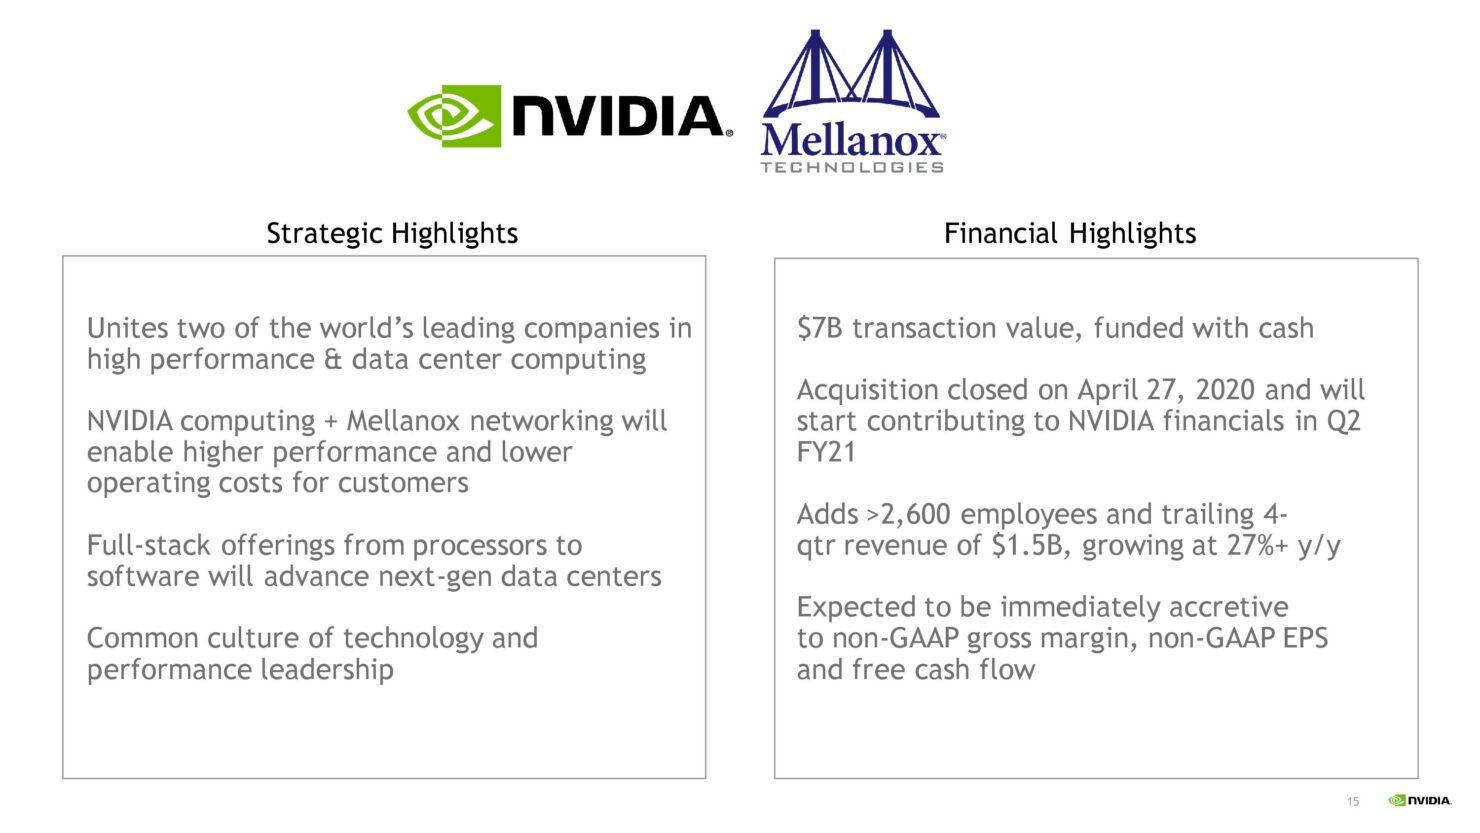 nvda-1qfy21-investor-presentation-5-21-20-final-page-015